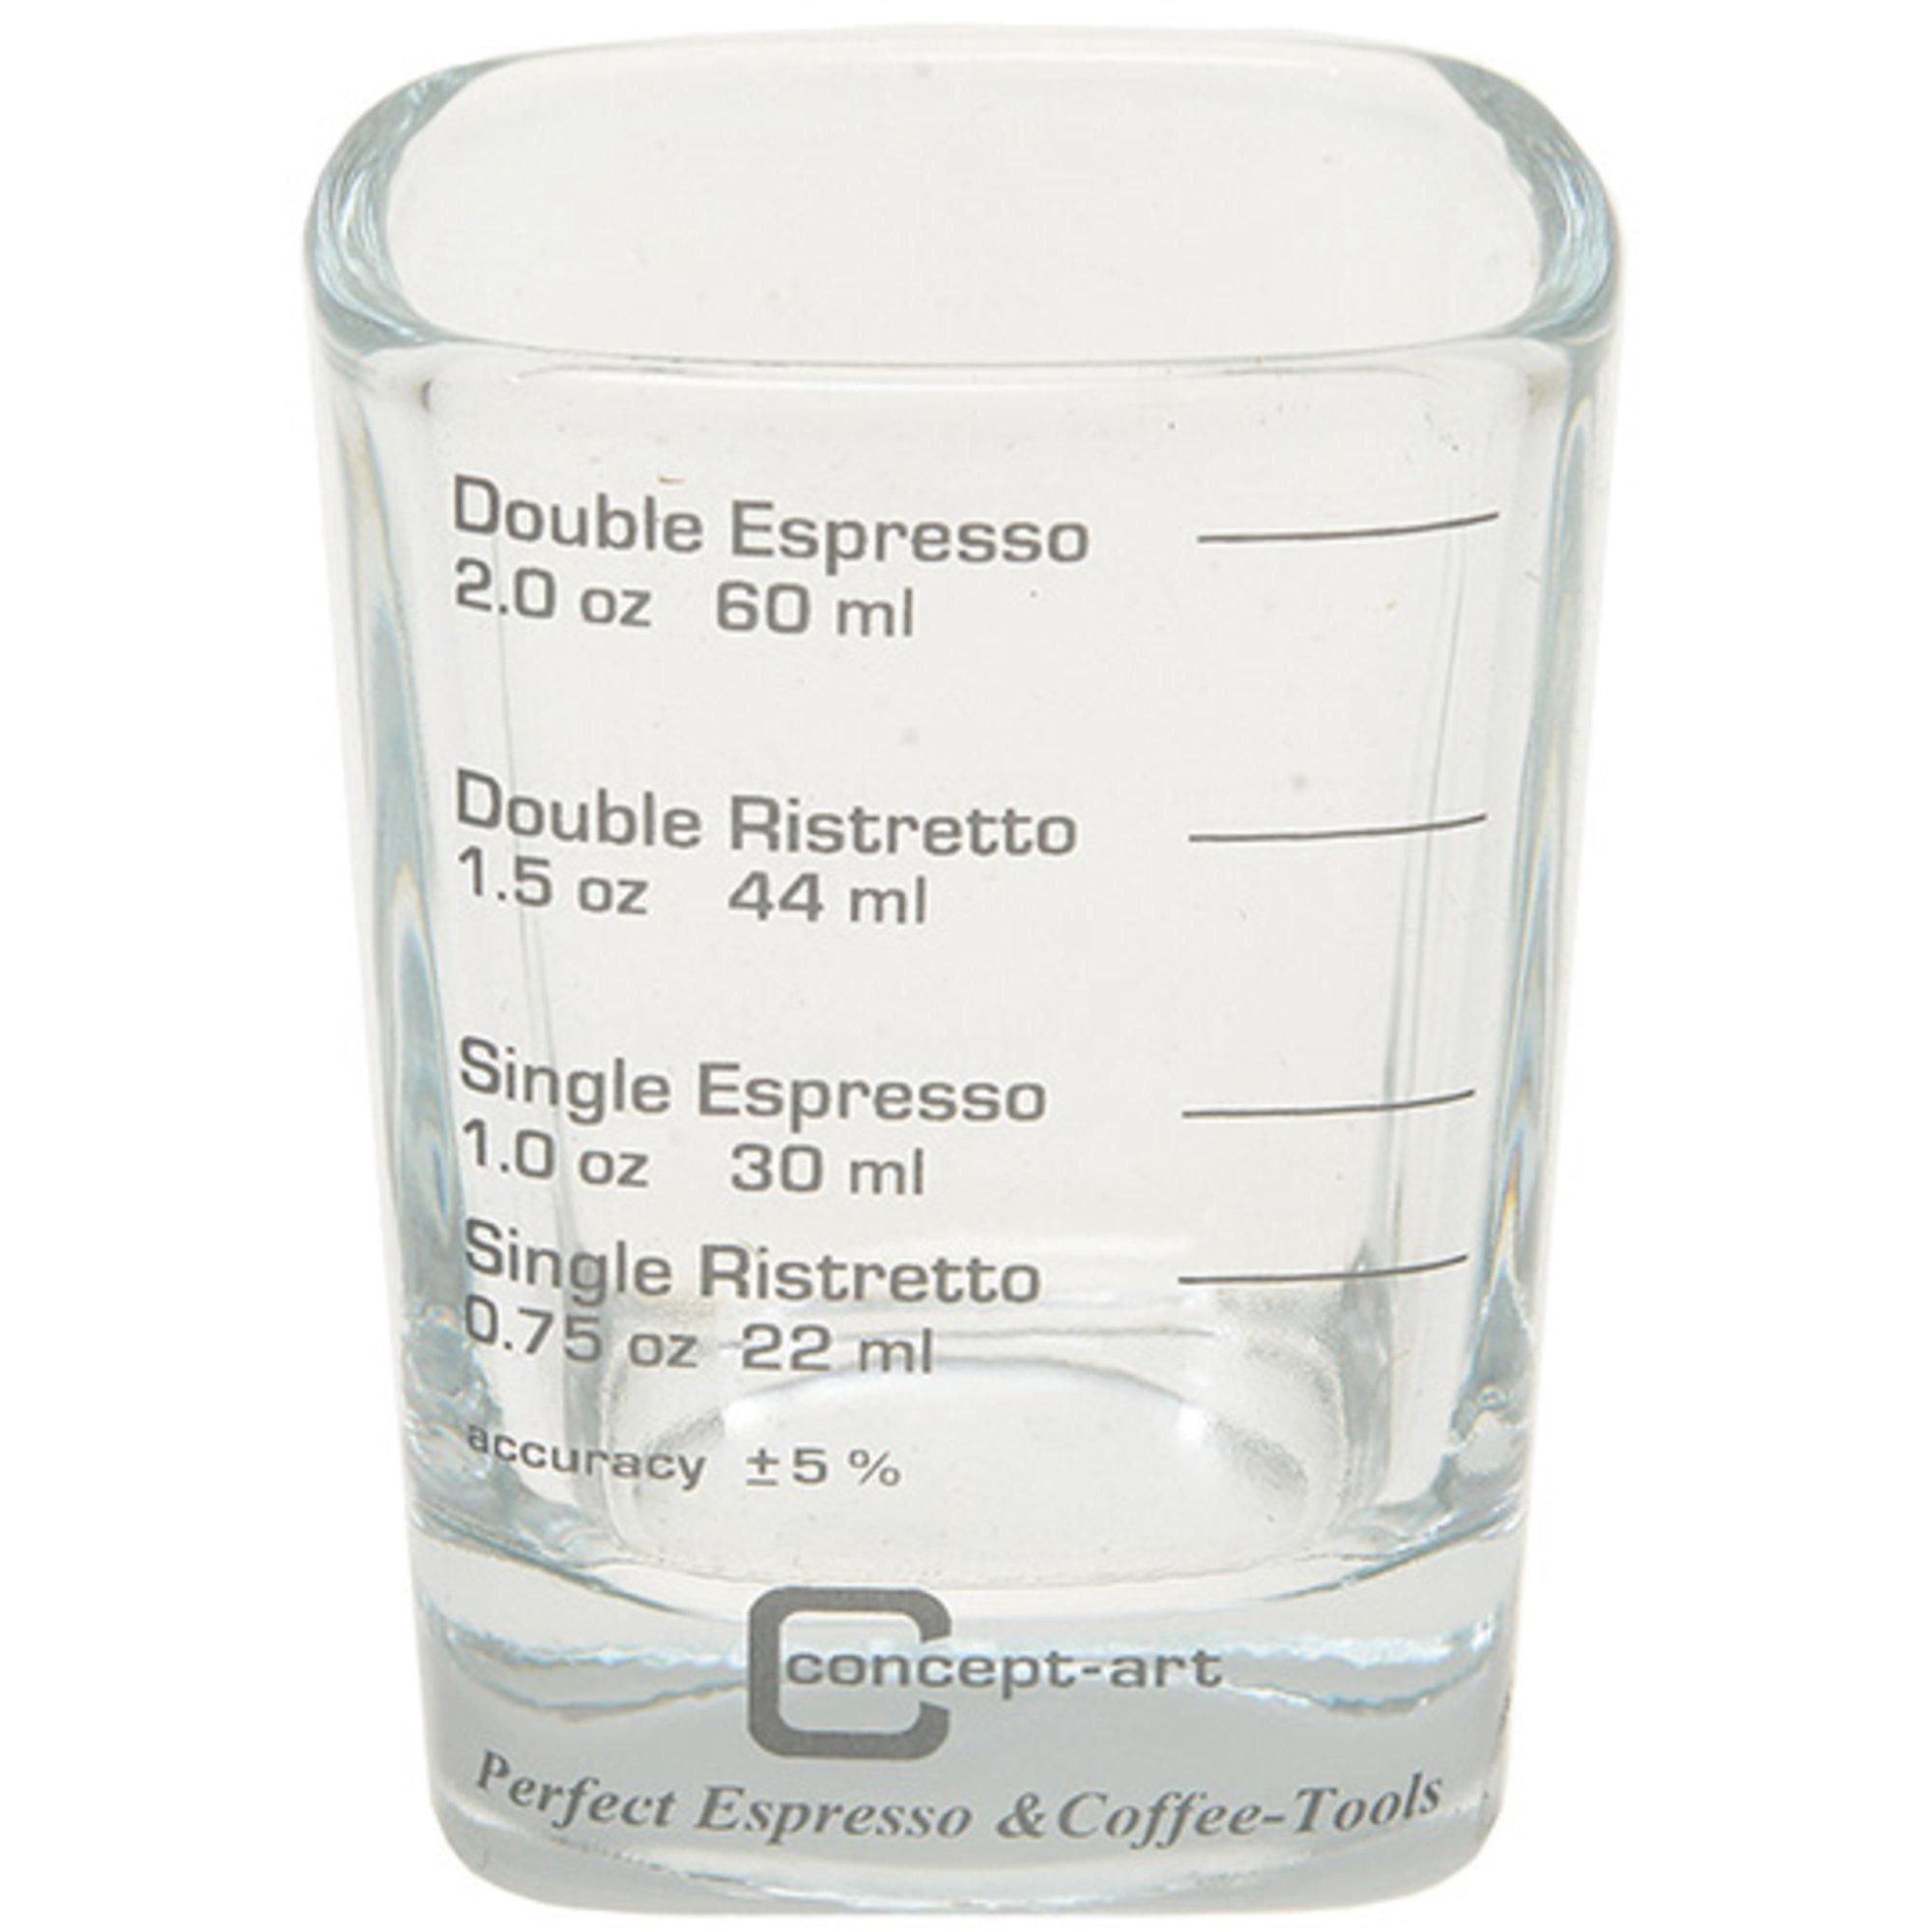 Concept-Art Mätbägare Glas